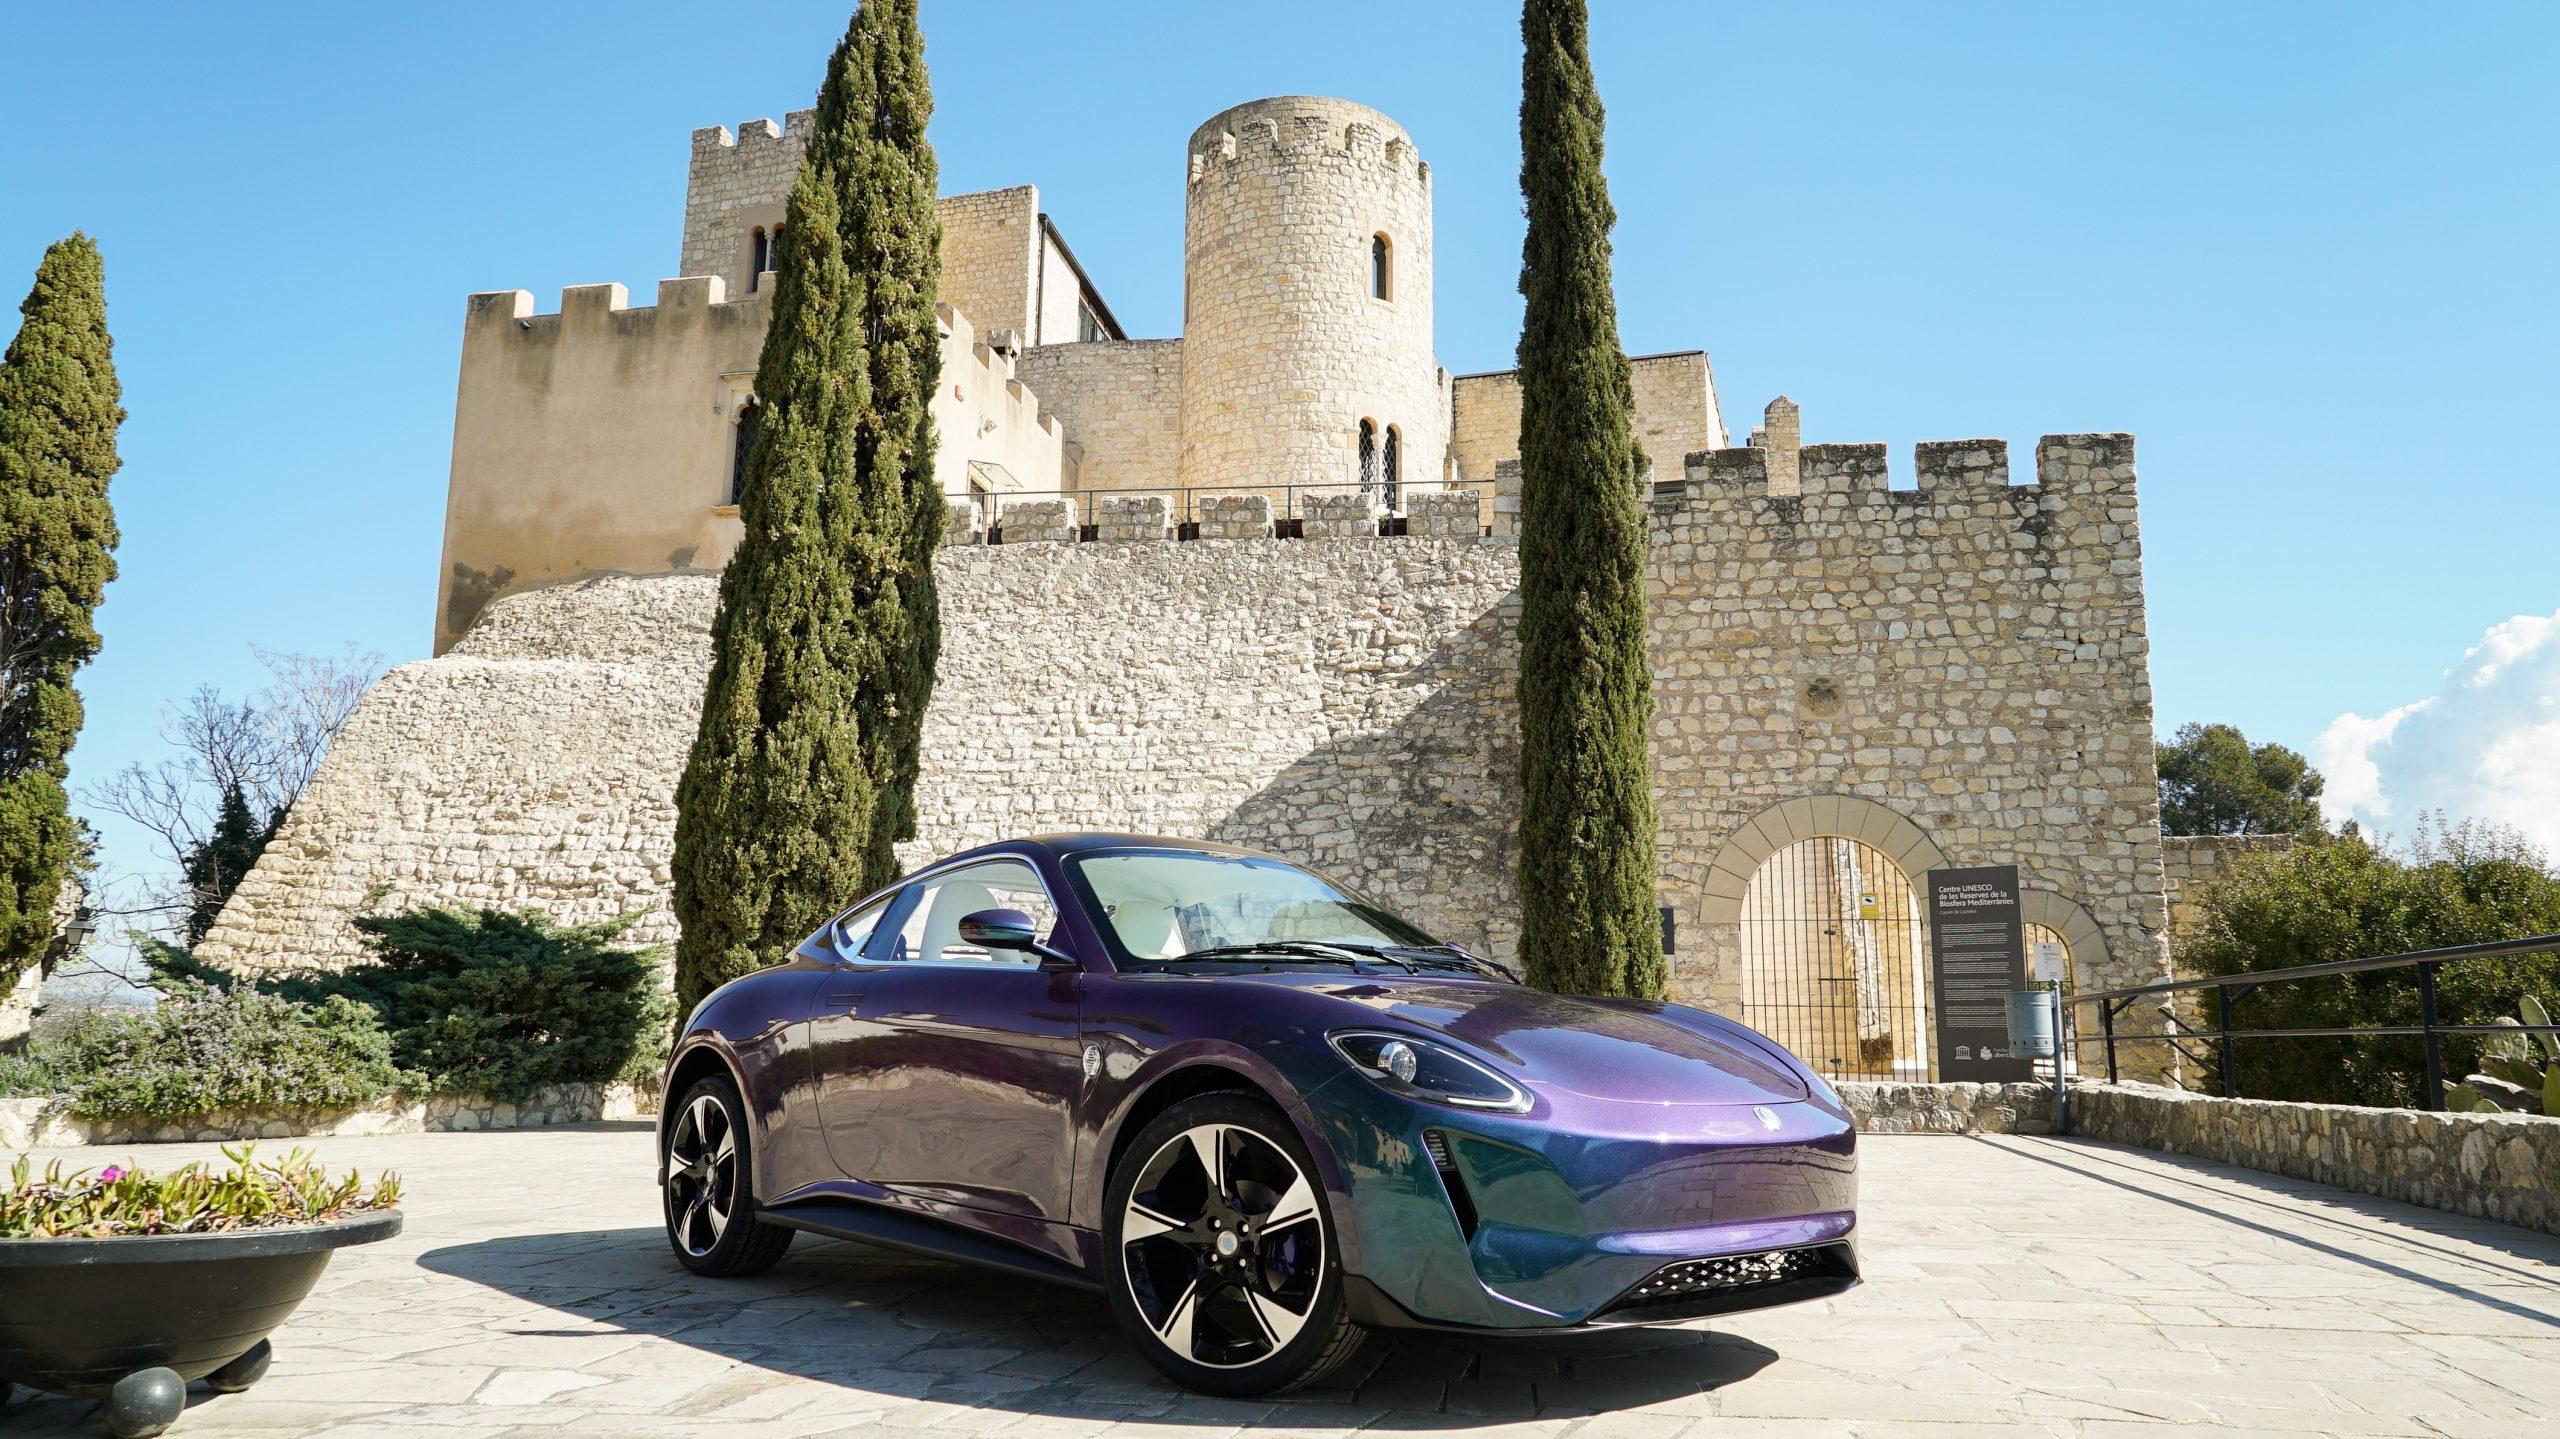 Zedriv GT3 in Barcelona landmark Castle of Castellet